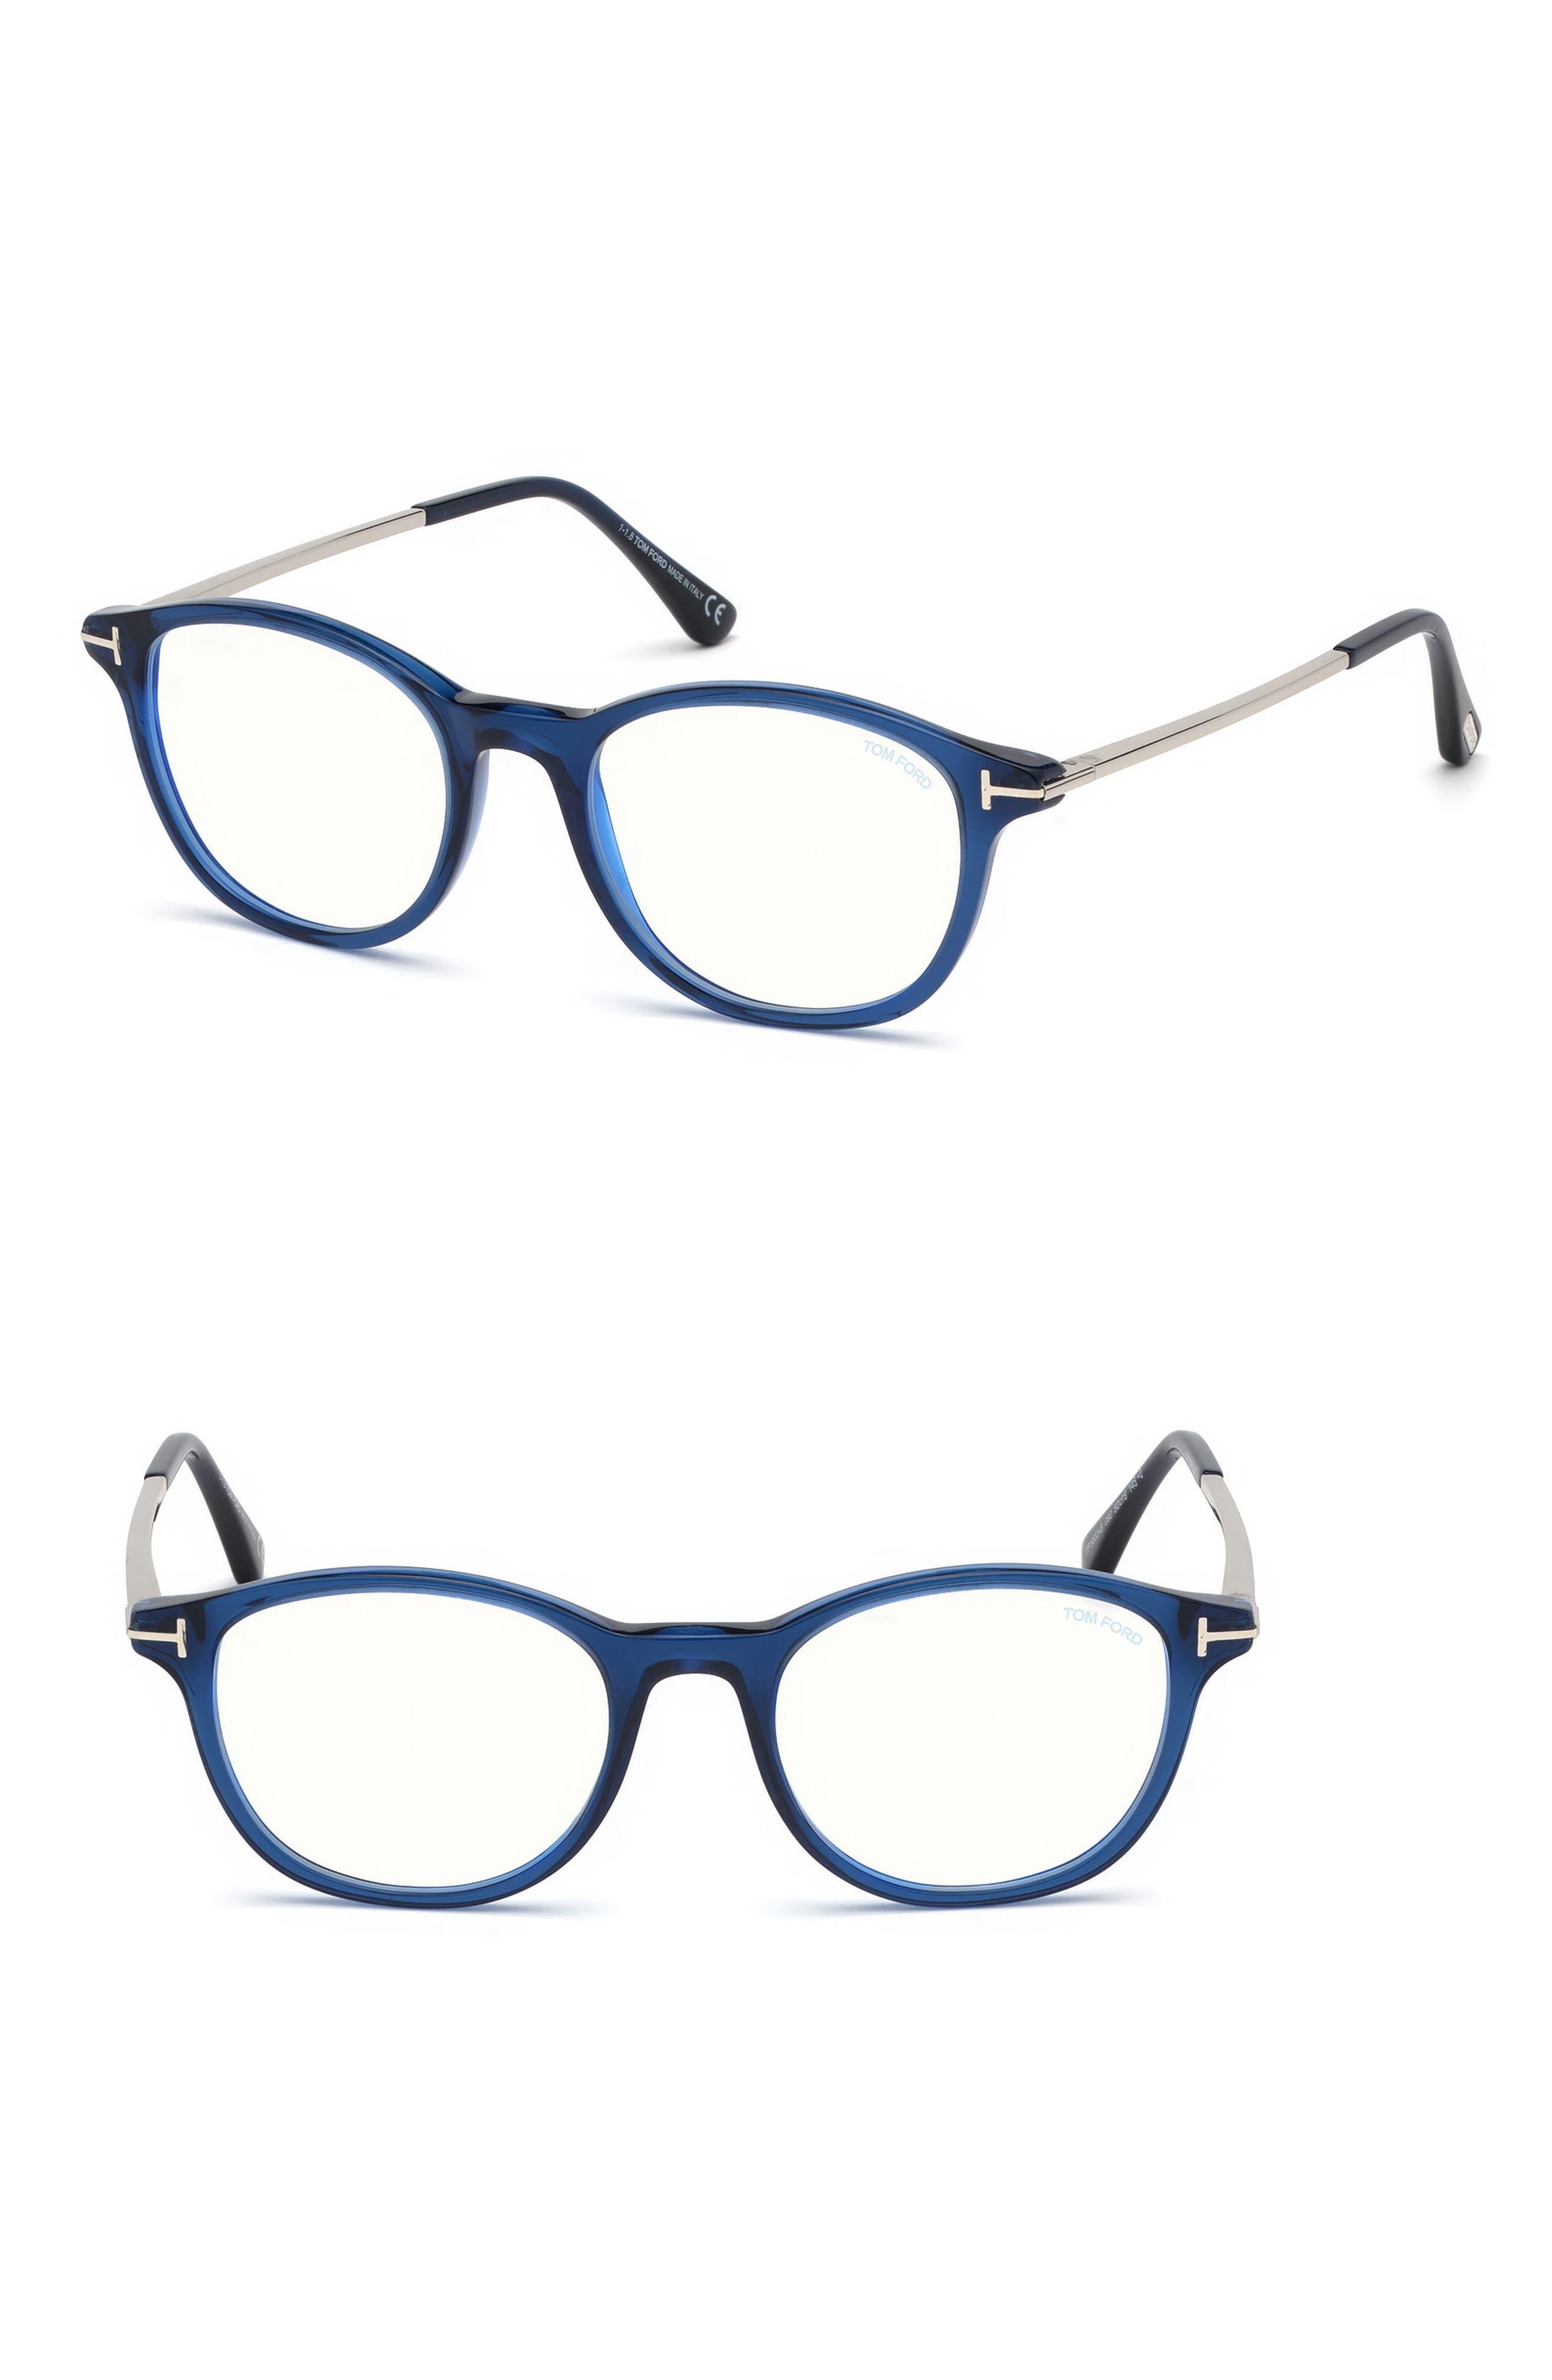 613375ee04c Men s Optical Frames Sunglasses   Eyeglasses